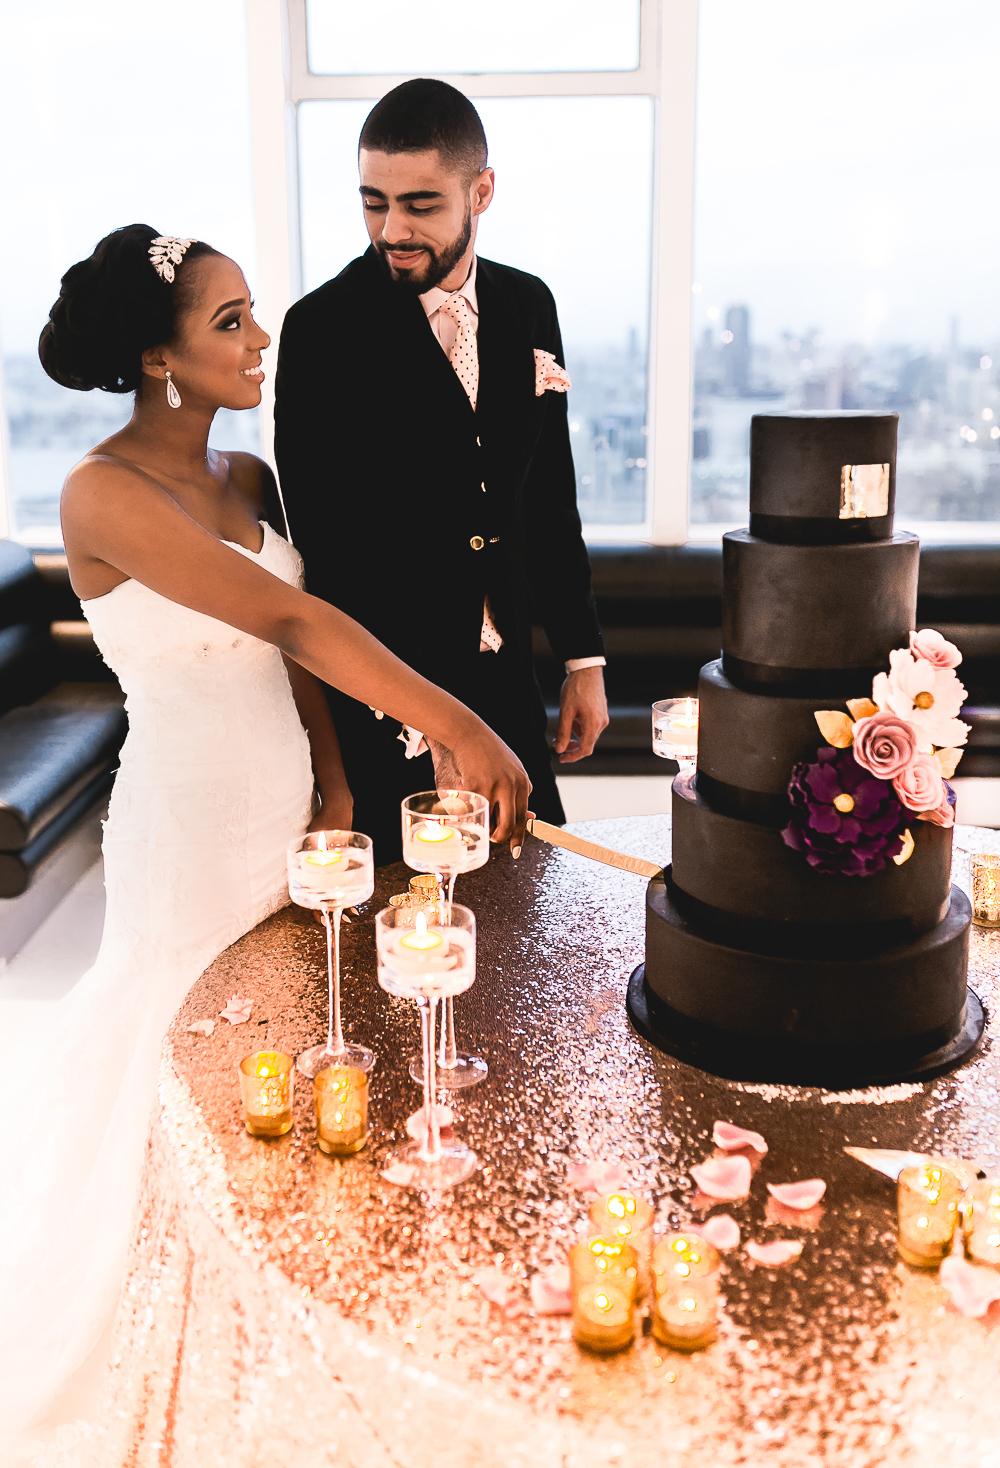 Wedding Photography at Altitude 360 London - Beatrici Photography-66.jpg